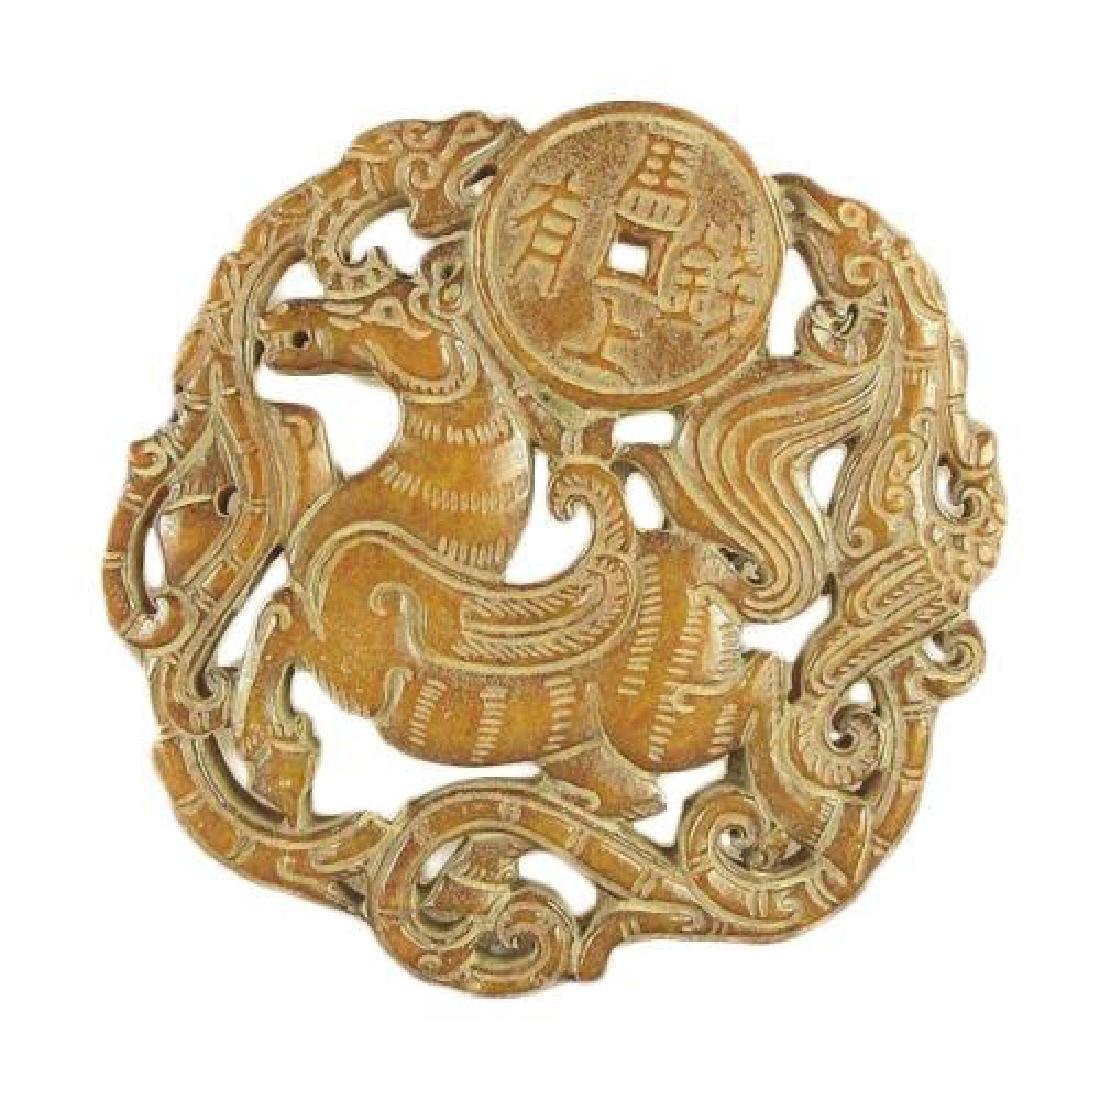 Openwork Chinese Old Pierced Jade Carved Horse Phoenix